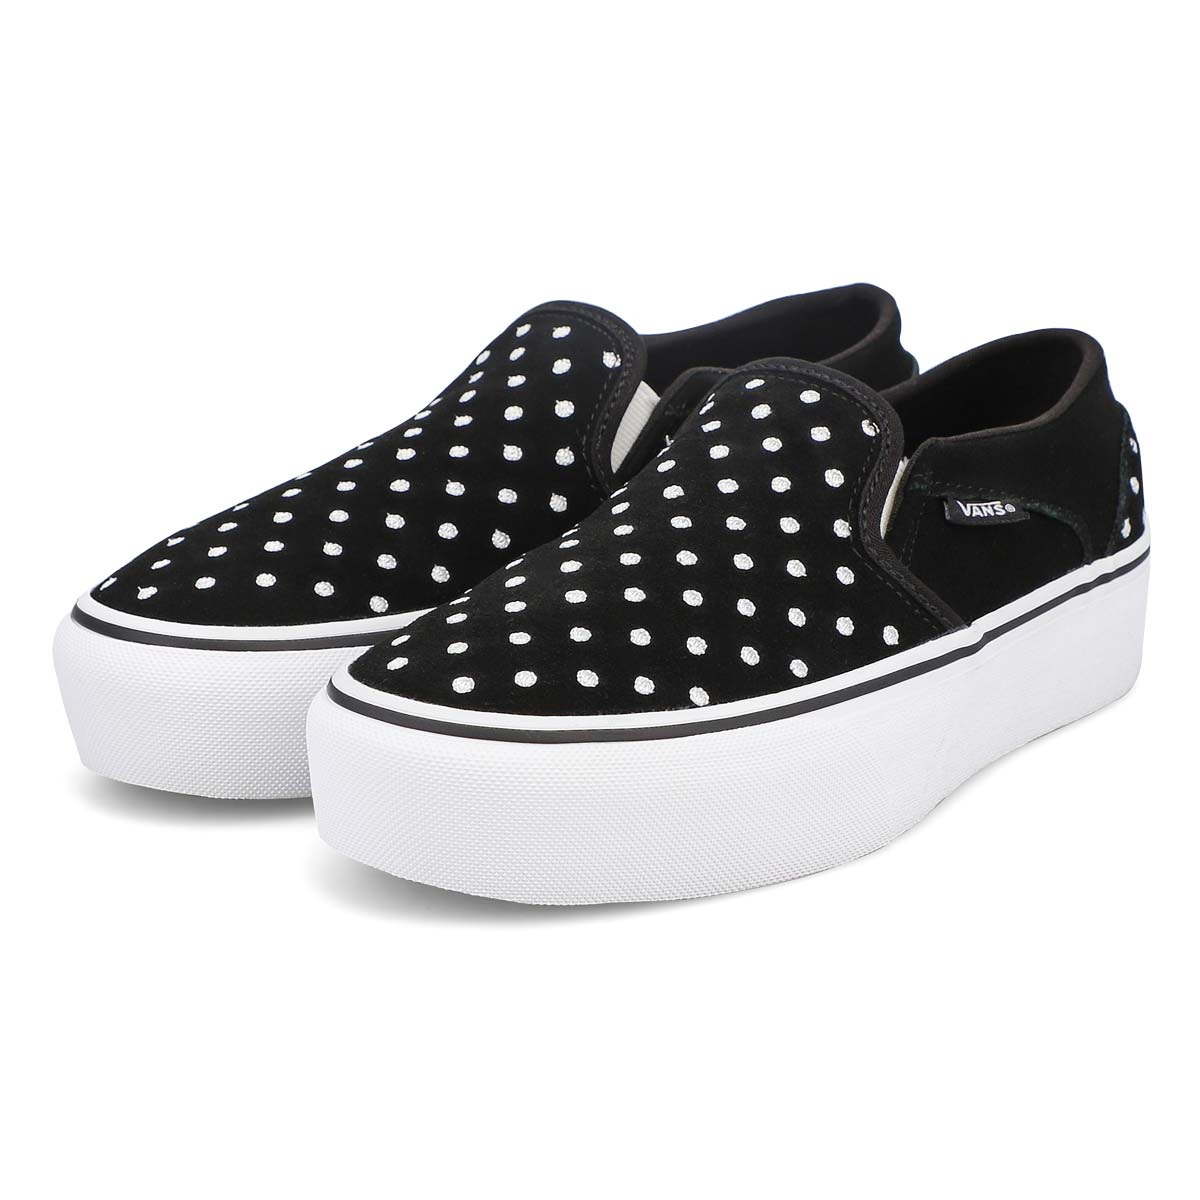 Women's Asher Platform Sneaker - Dots/Black